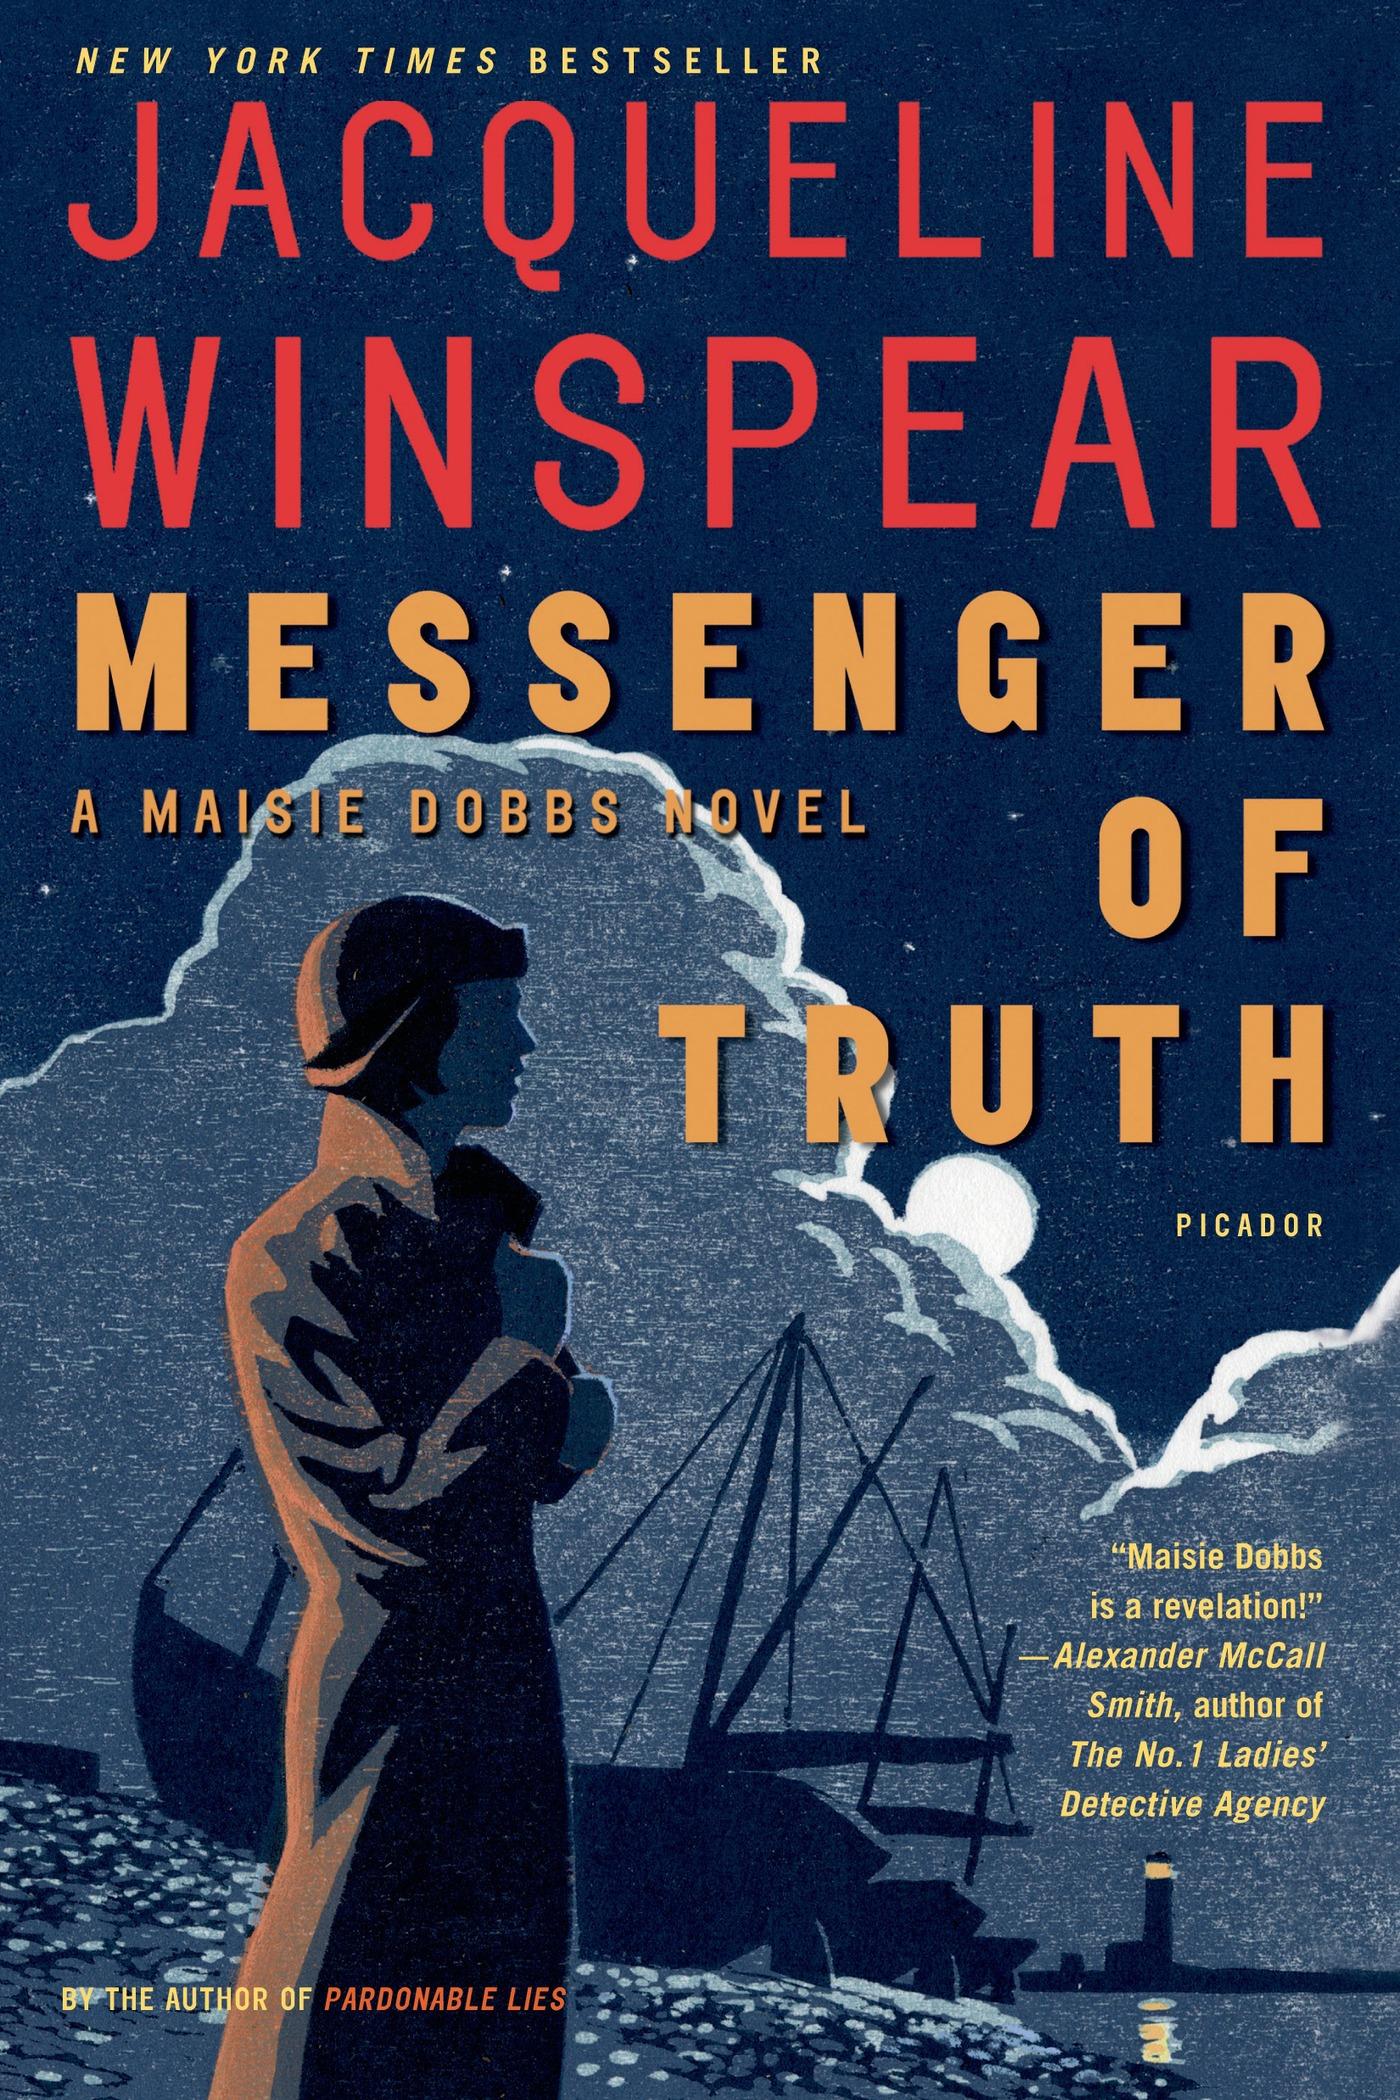 Messenger of truth a Maisie Dobbs novel